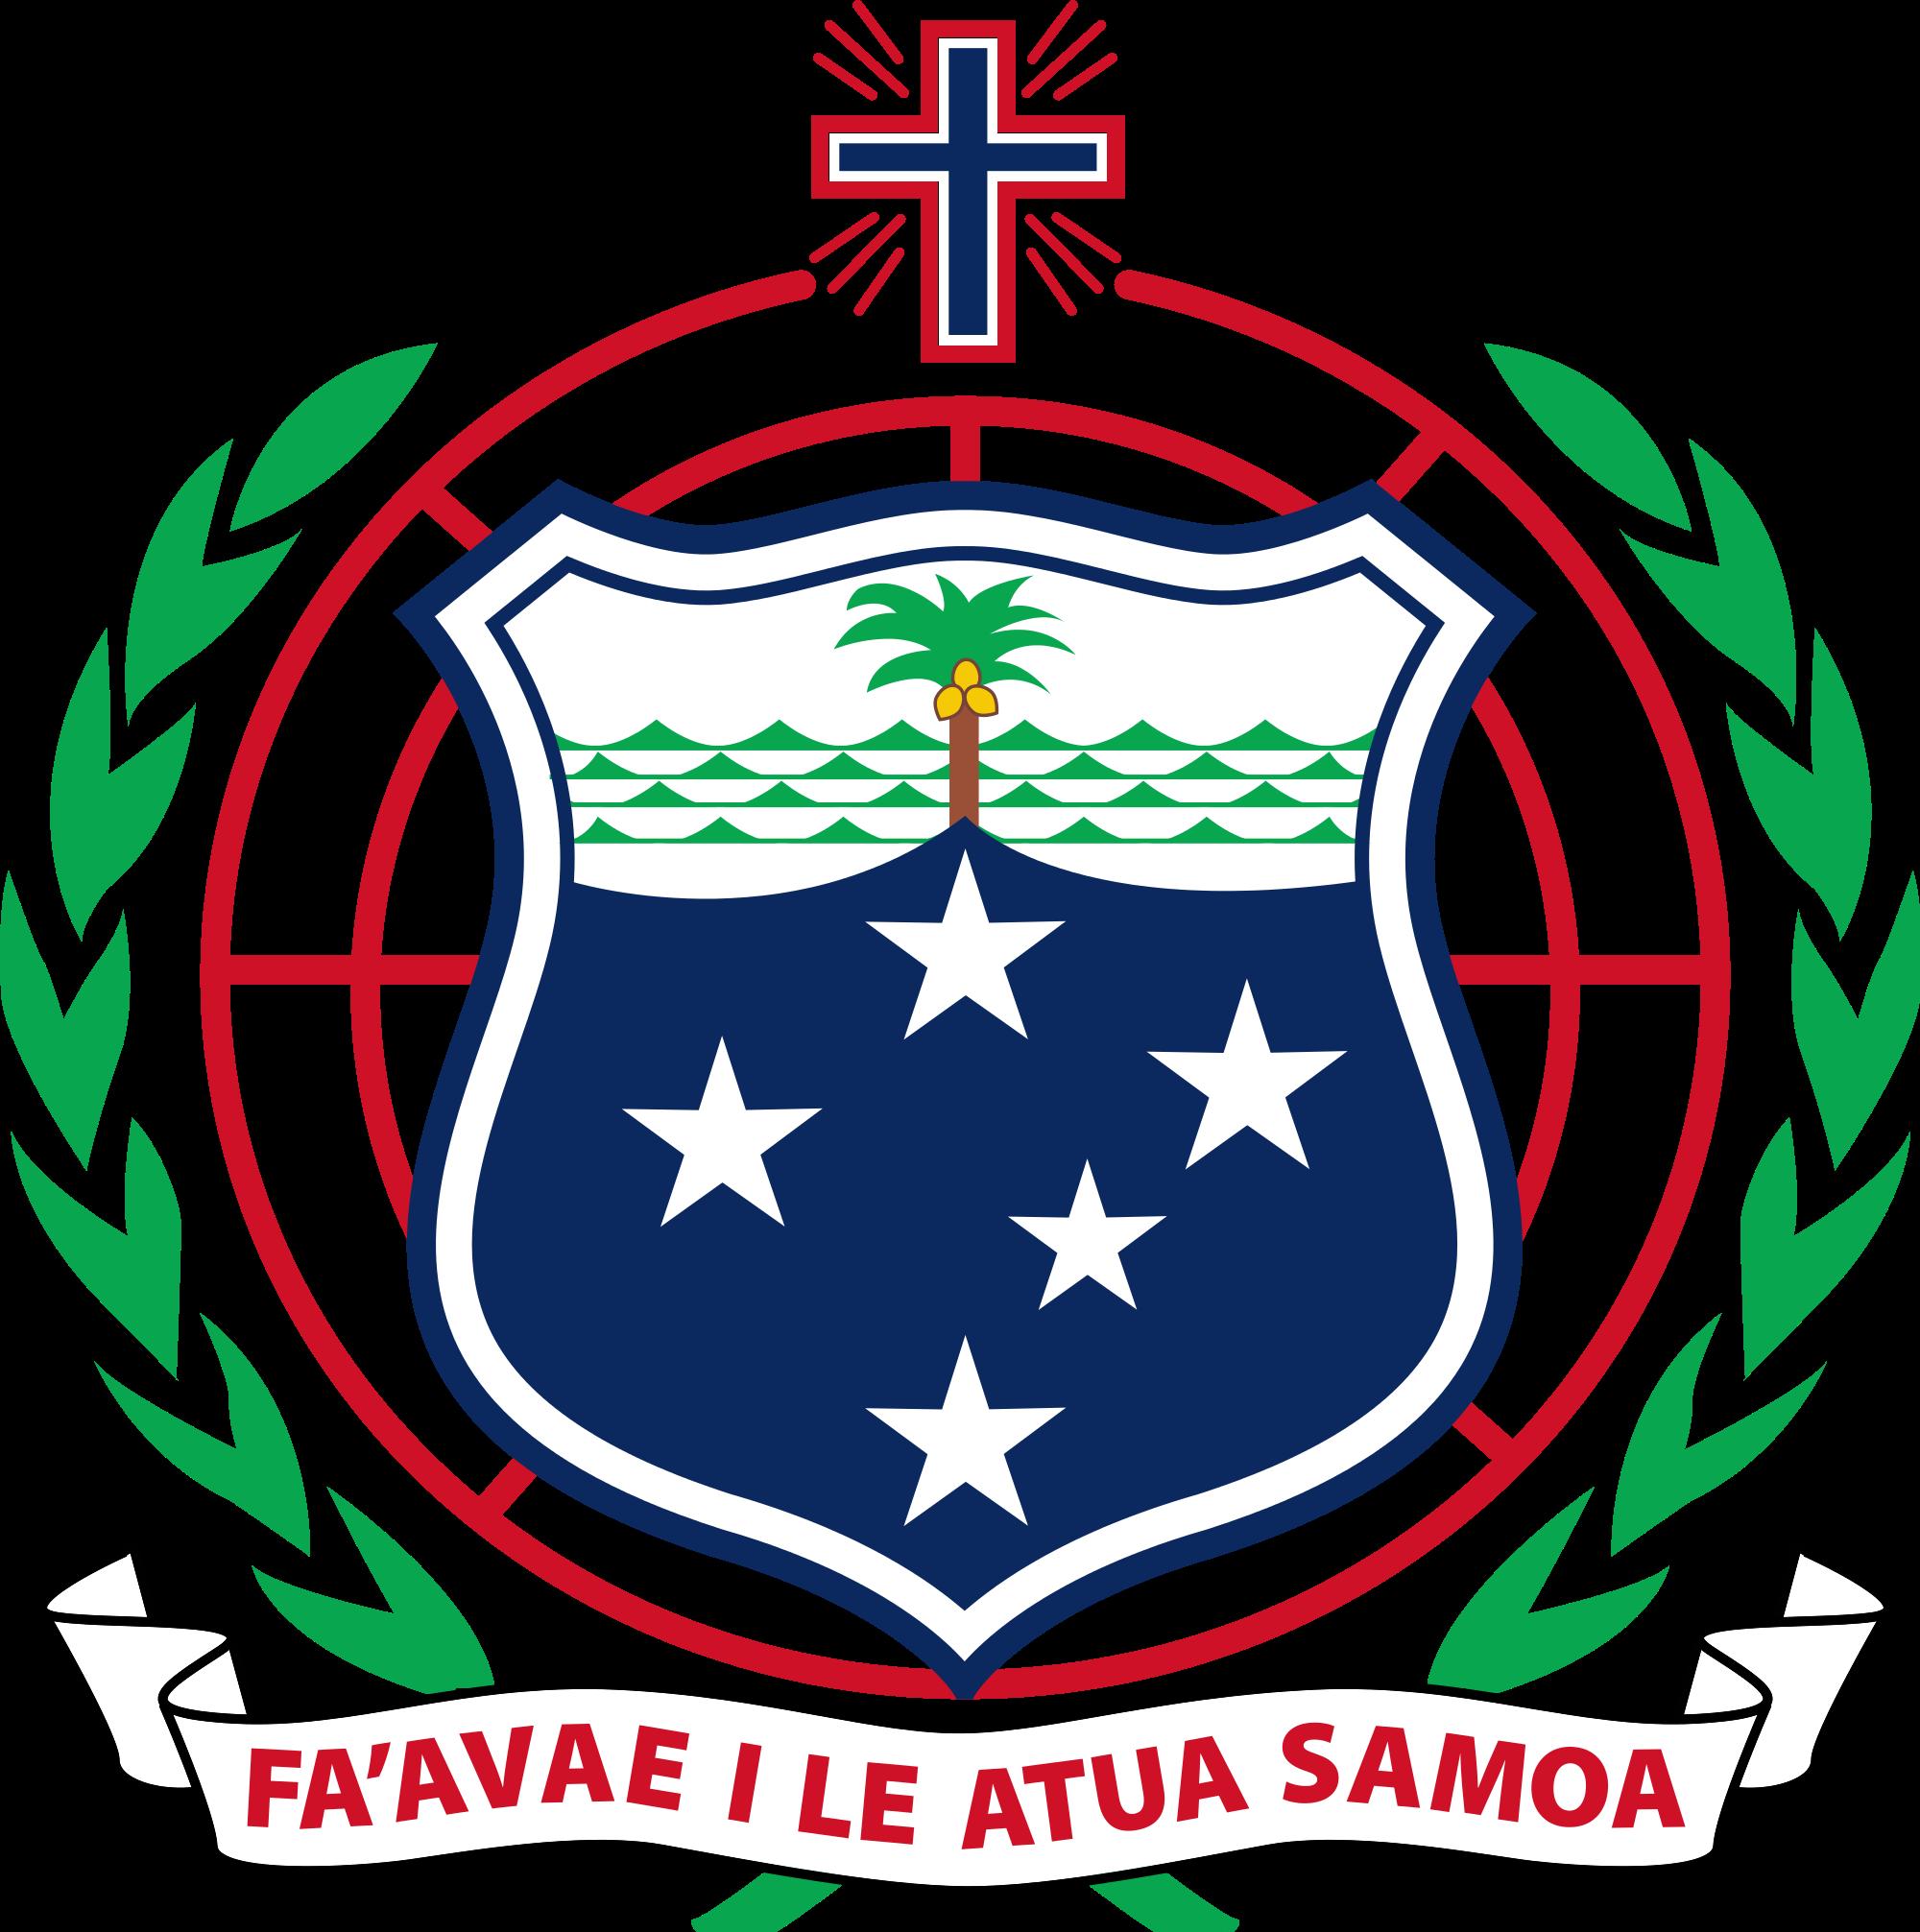 Seal of Samoa